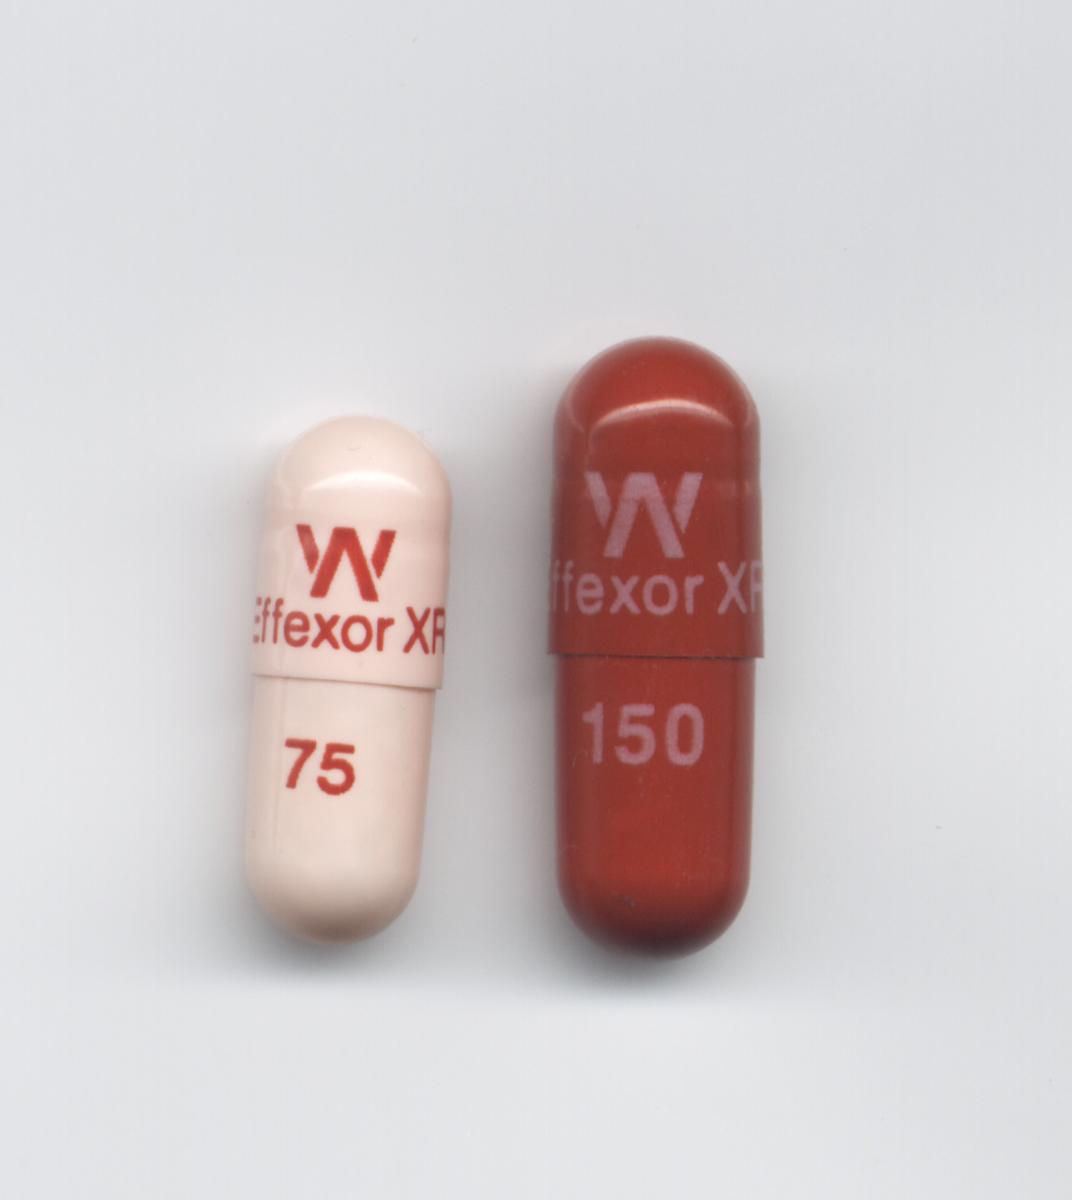 Effexor Withdrawal - Symptoms & Advice